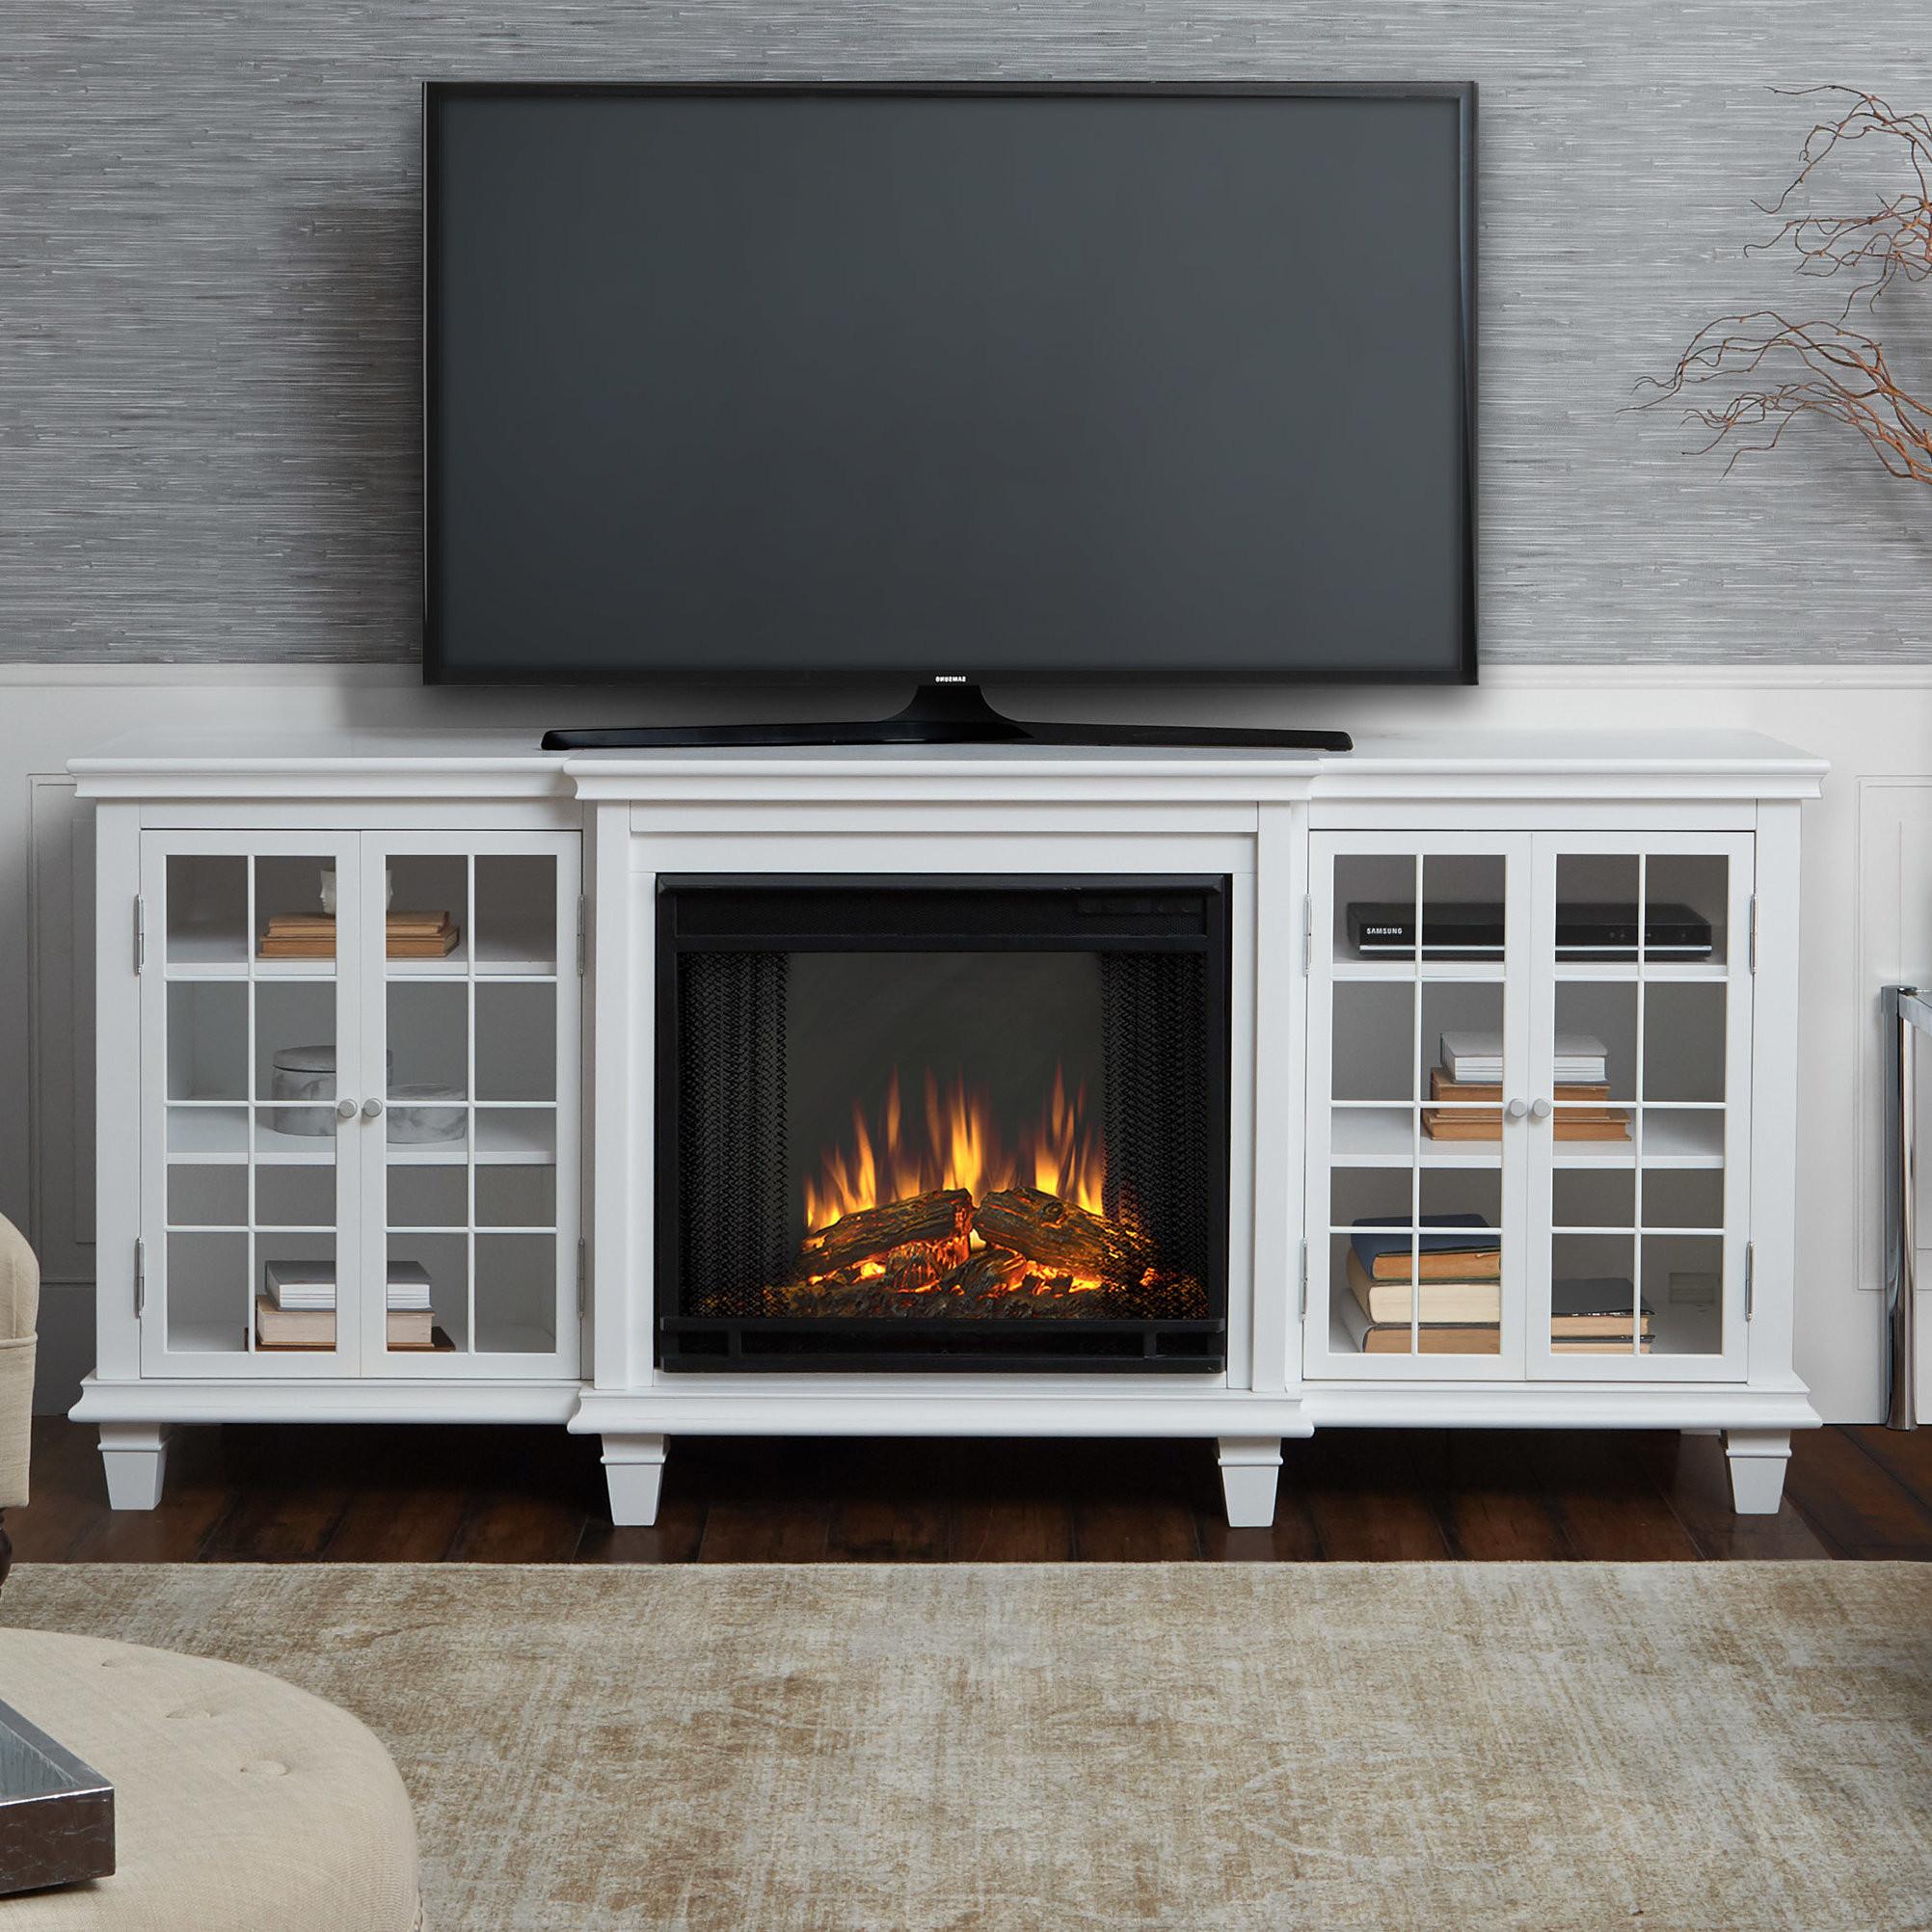 Electric Fireplace Tv Stand Menards  20 Elegant Menards Electric Fireplace Tv Stand